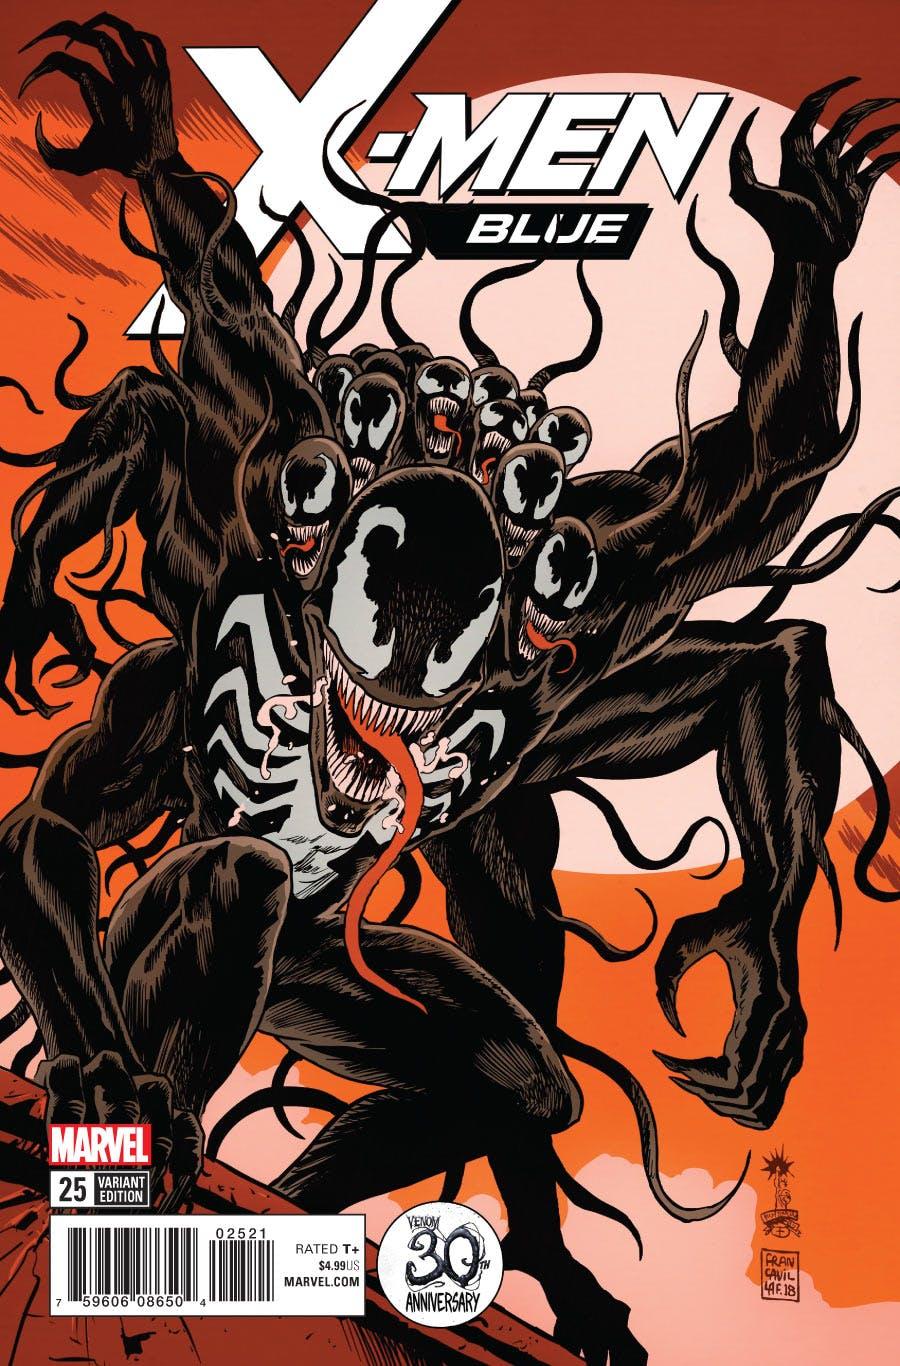 X-Men Blue Vol 1 25 Venom 30th Anniversary Variant.jpg